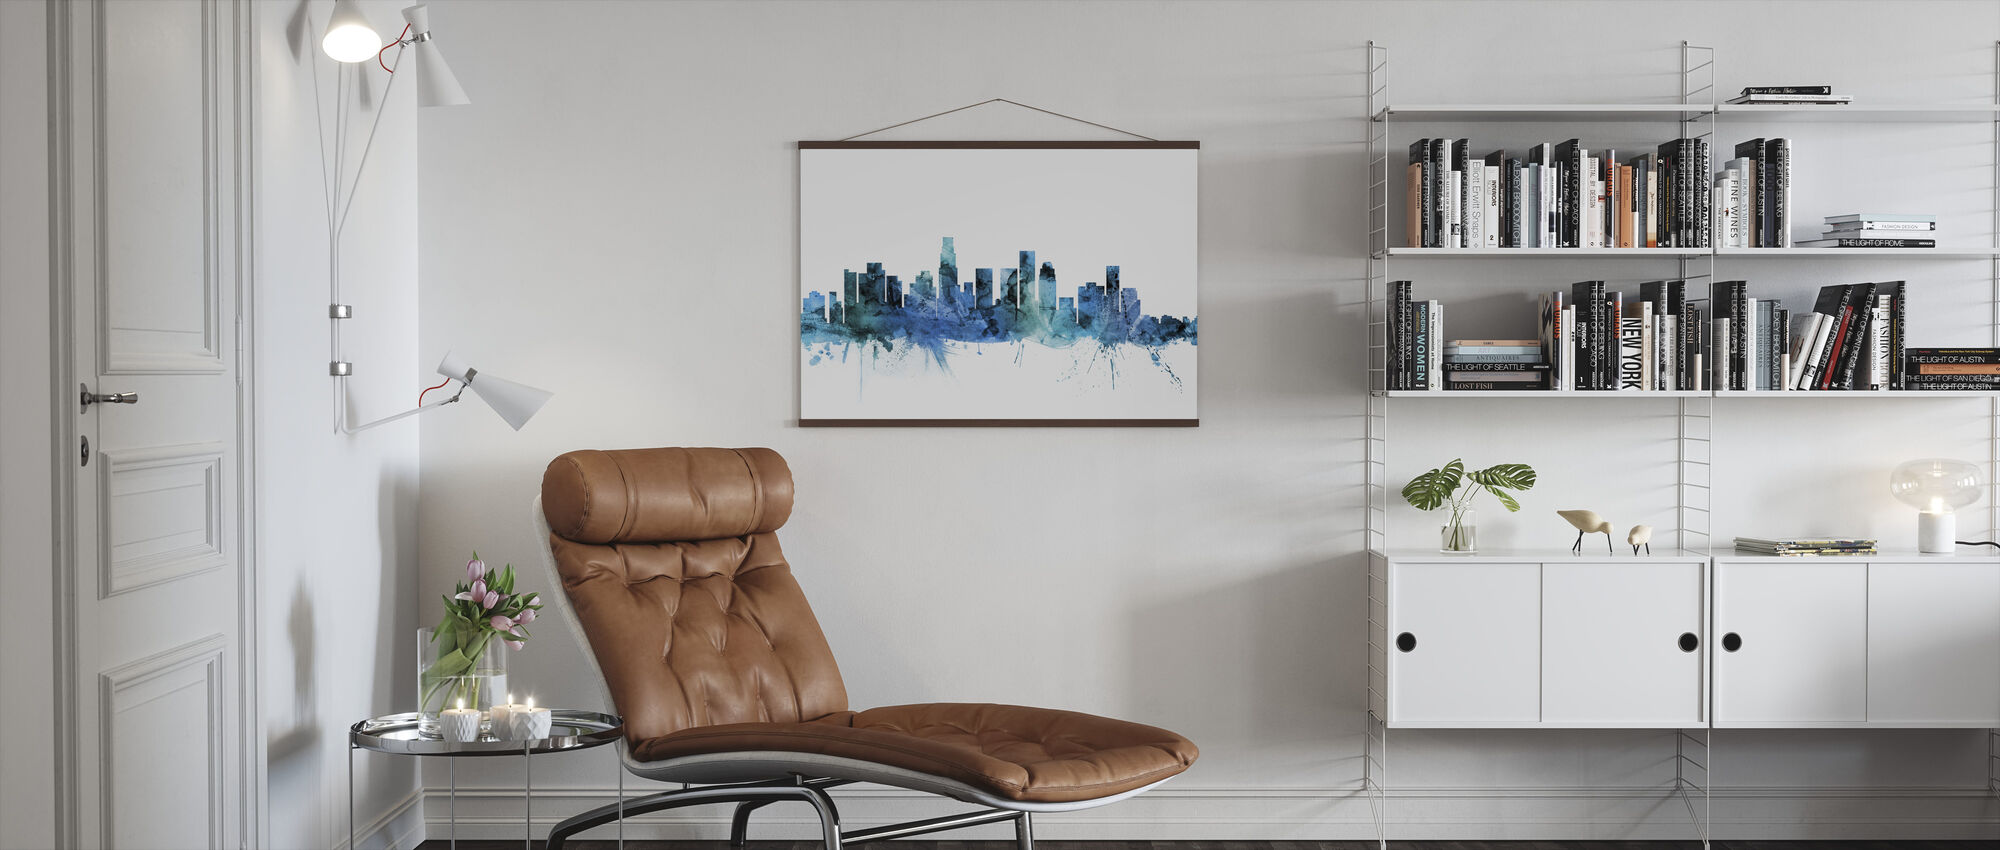 Los Angeles California Skyline - Poster - Living Room